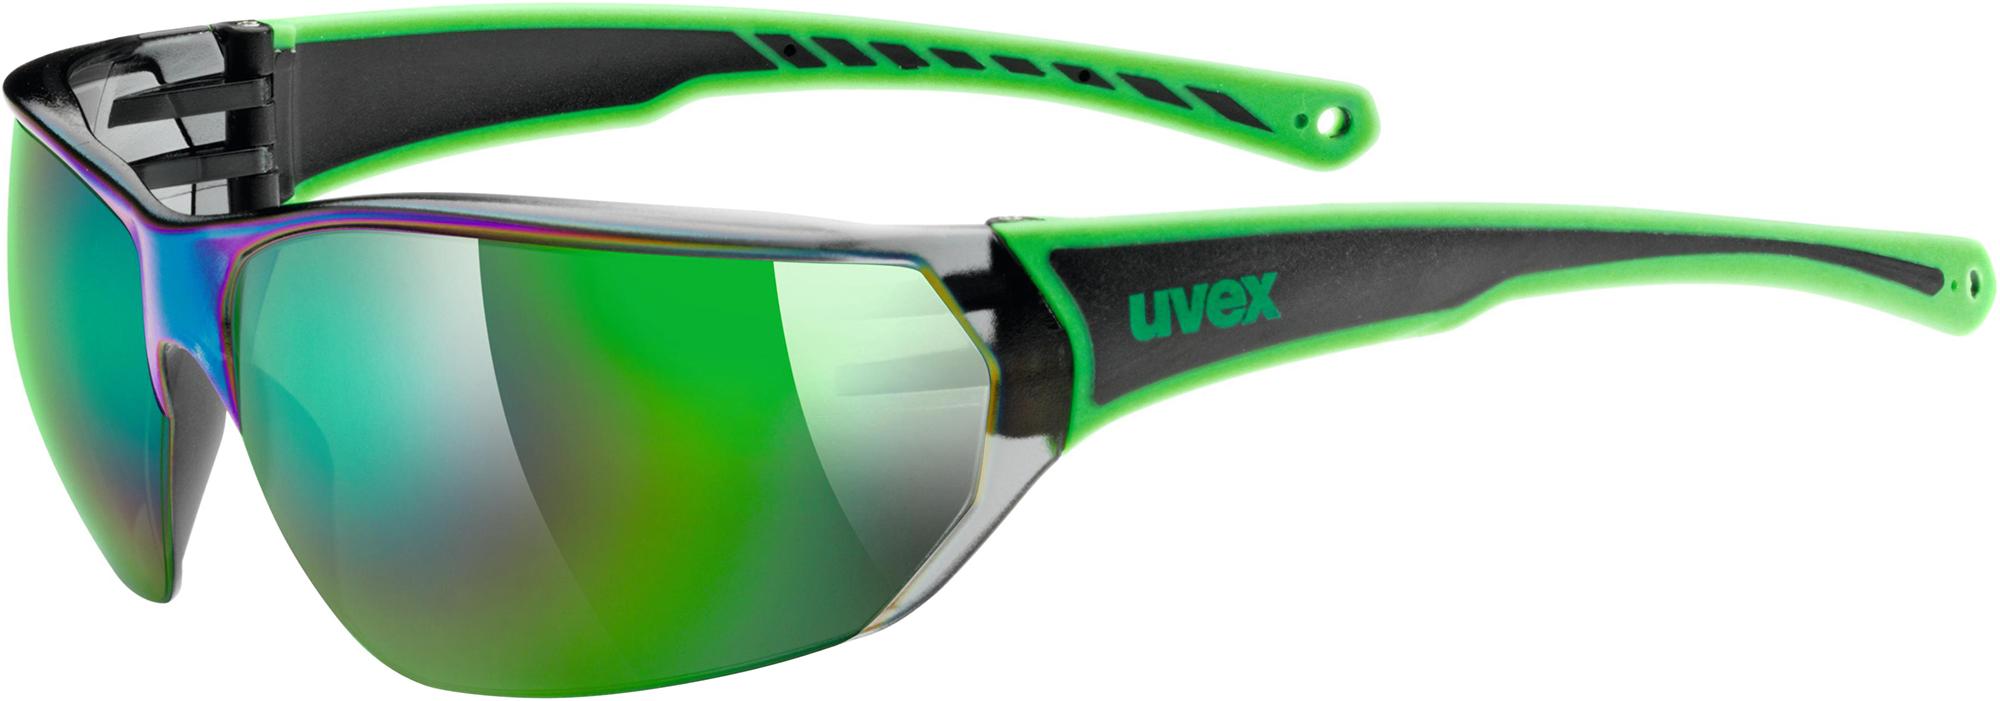 Uvex Солнцезащитные очки Sportstyle 204